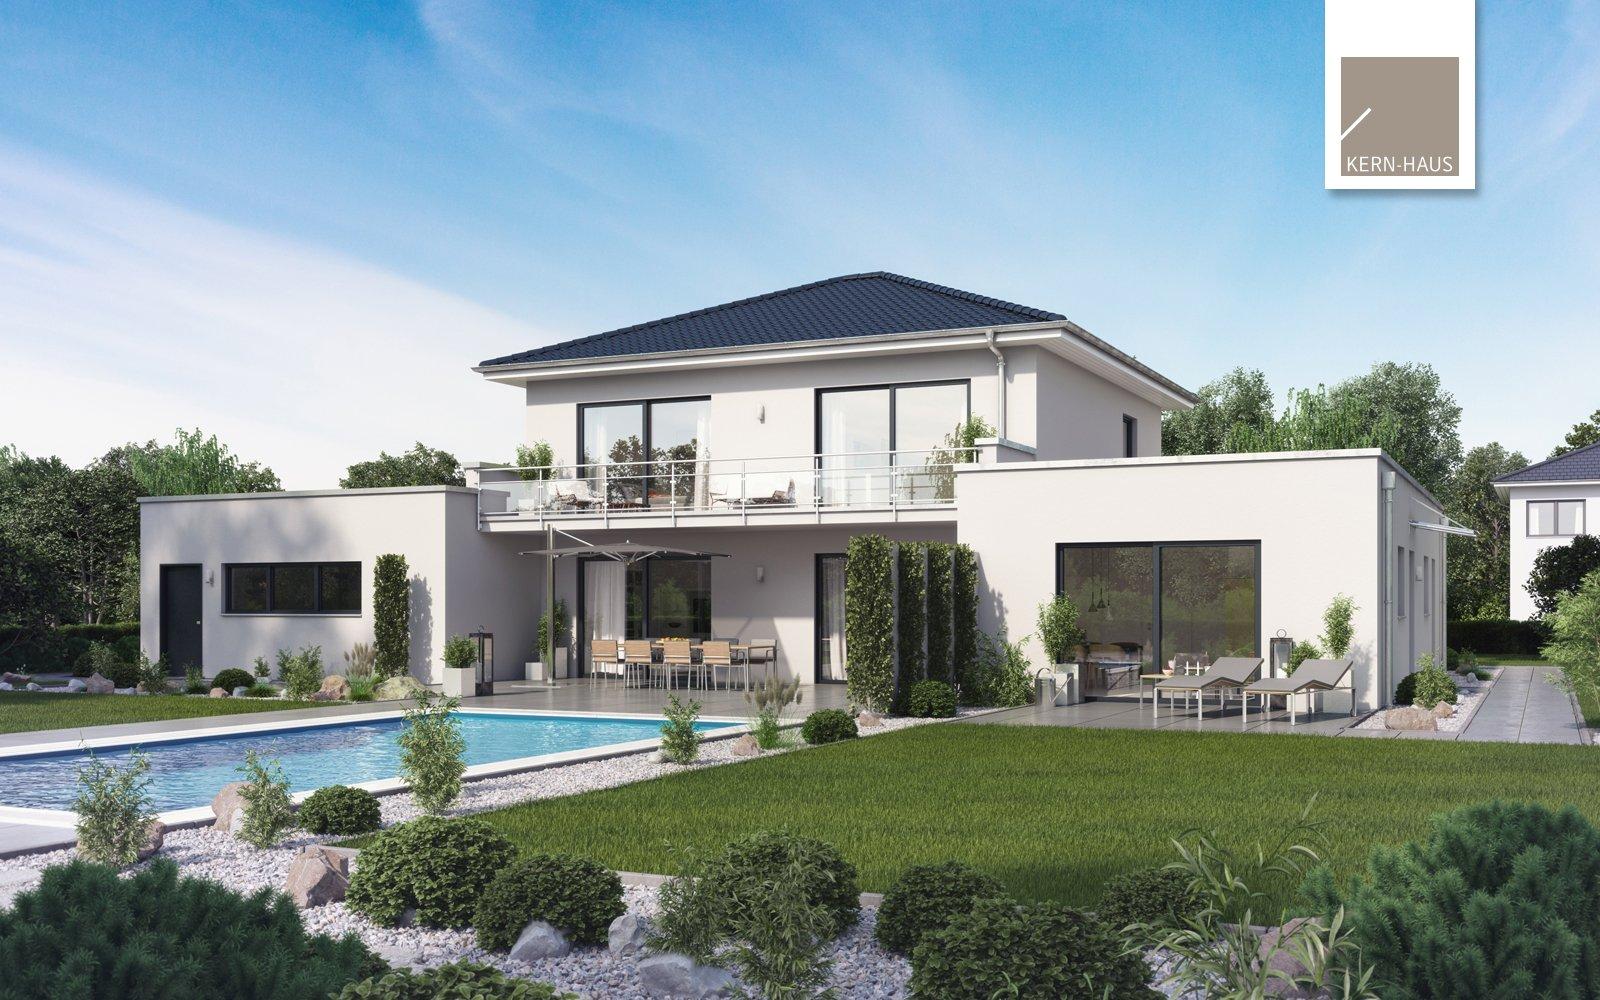 Kern-Haus Mehrfamilienhaus Vivaro Gartenseite